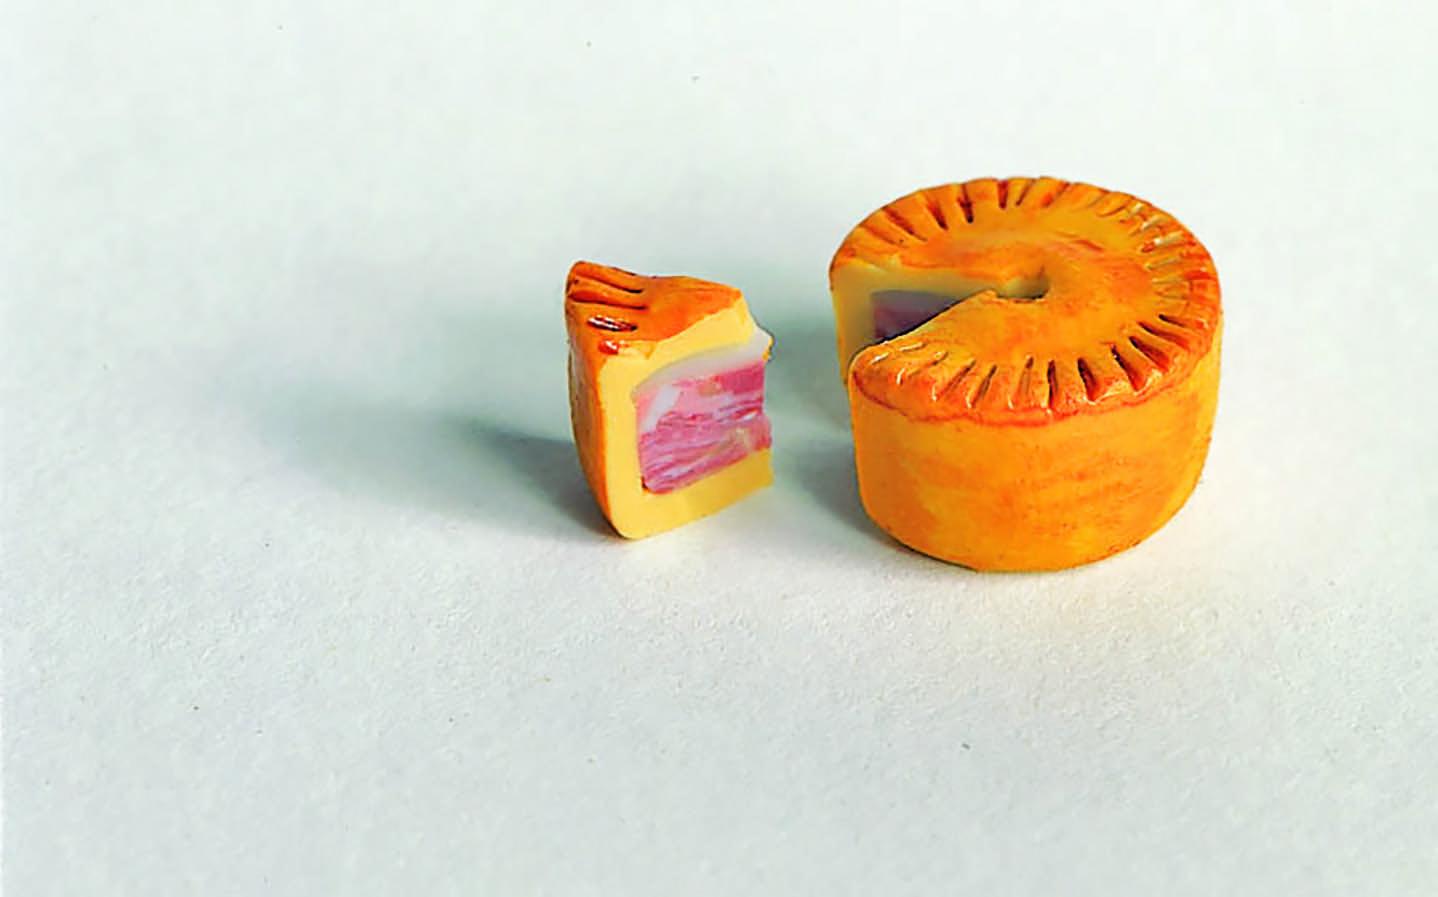 Miniature Pork Pie step final